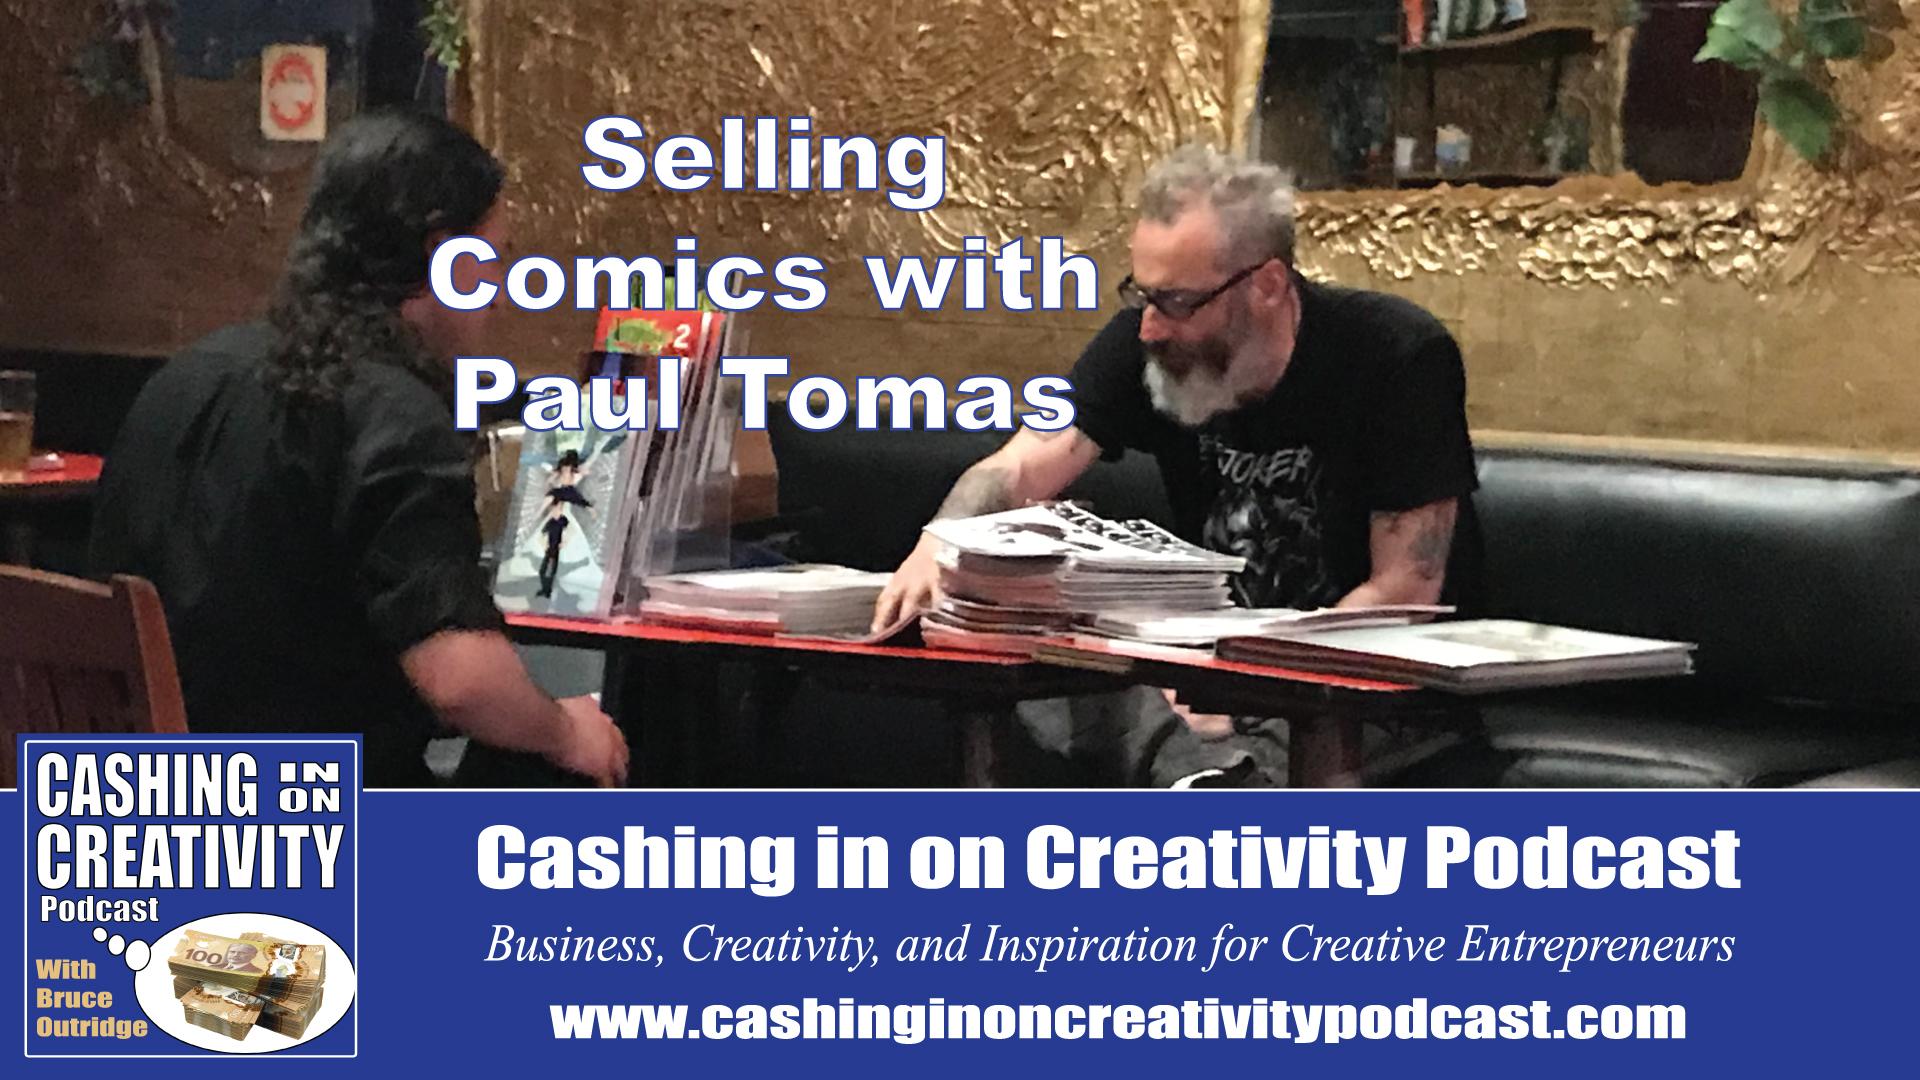 Comic artist Paul Tomas